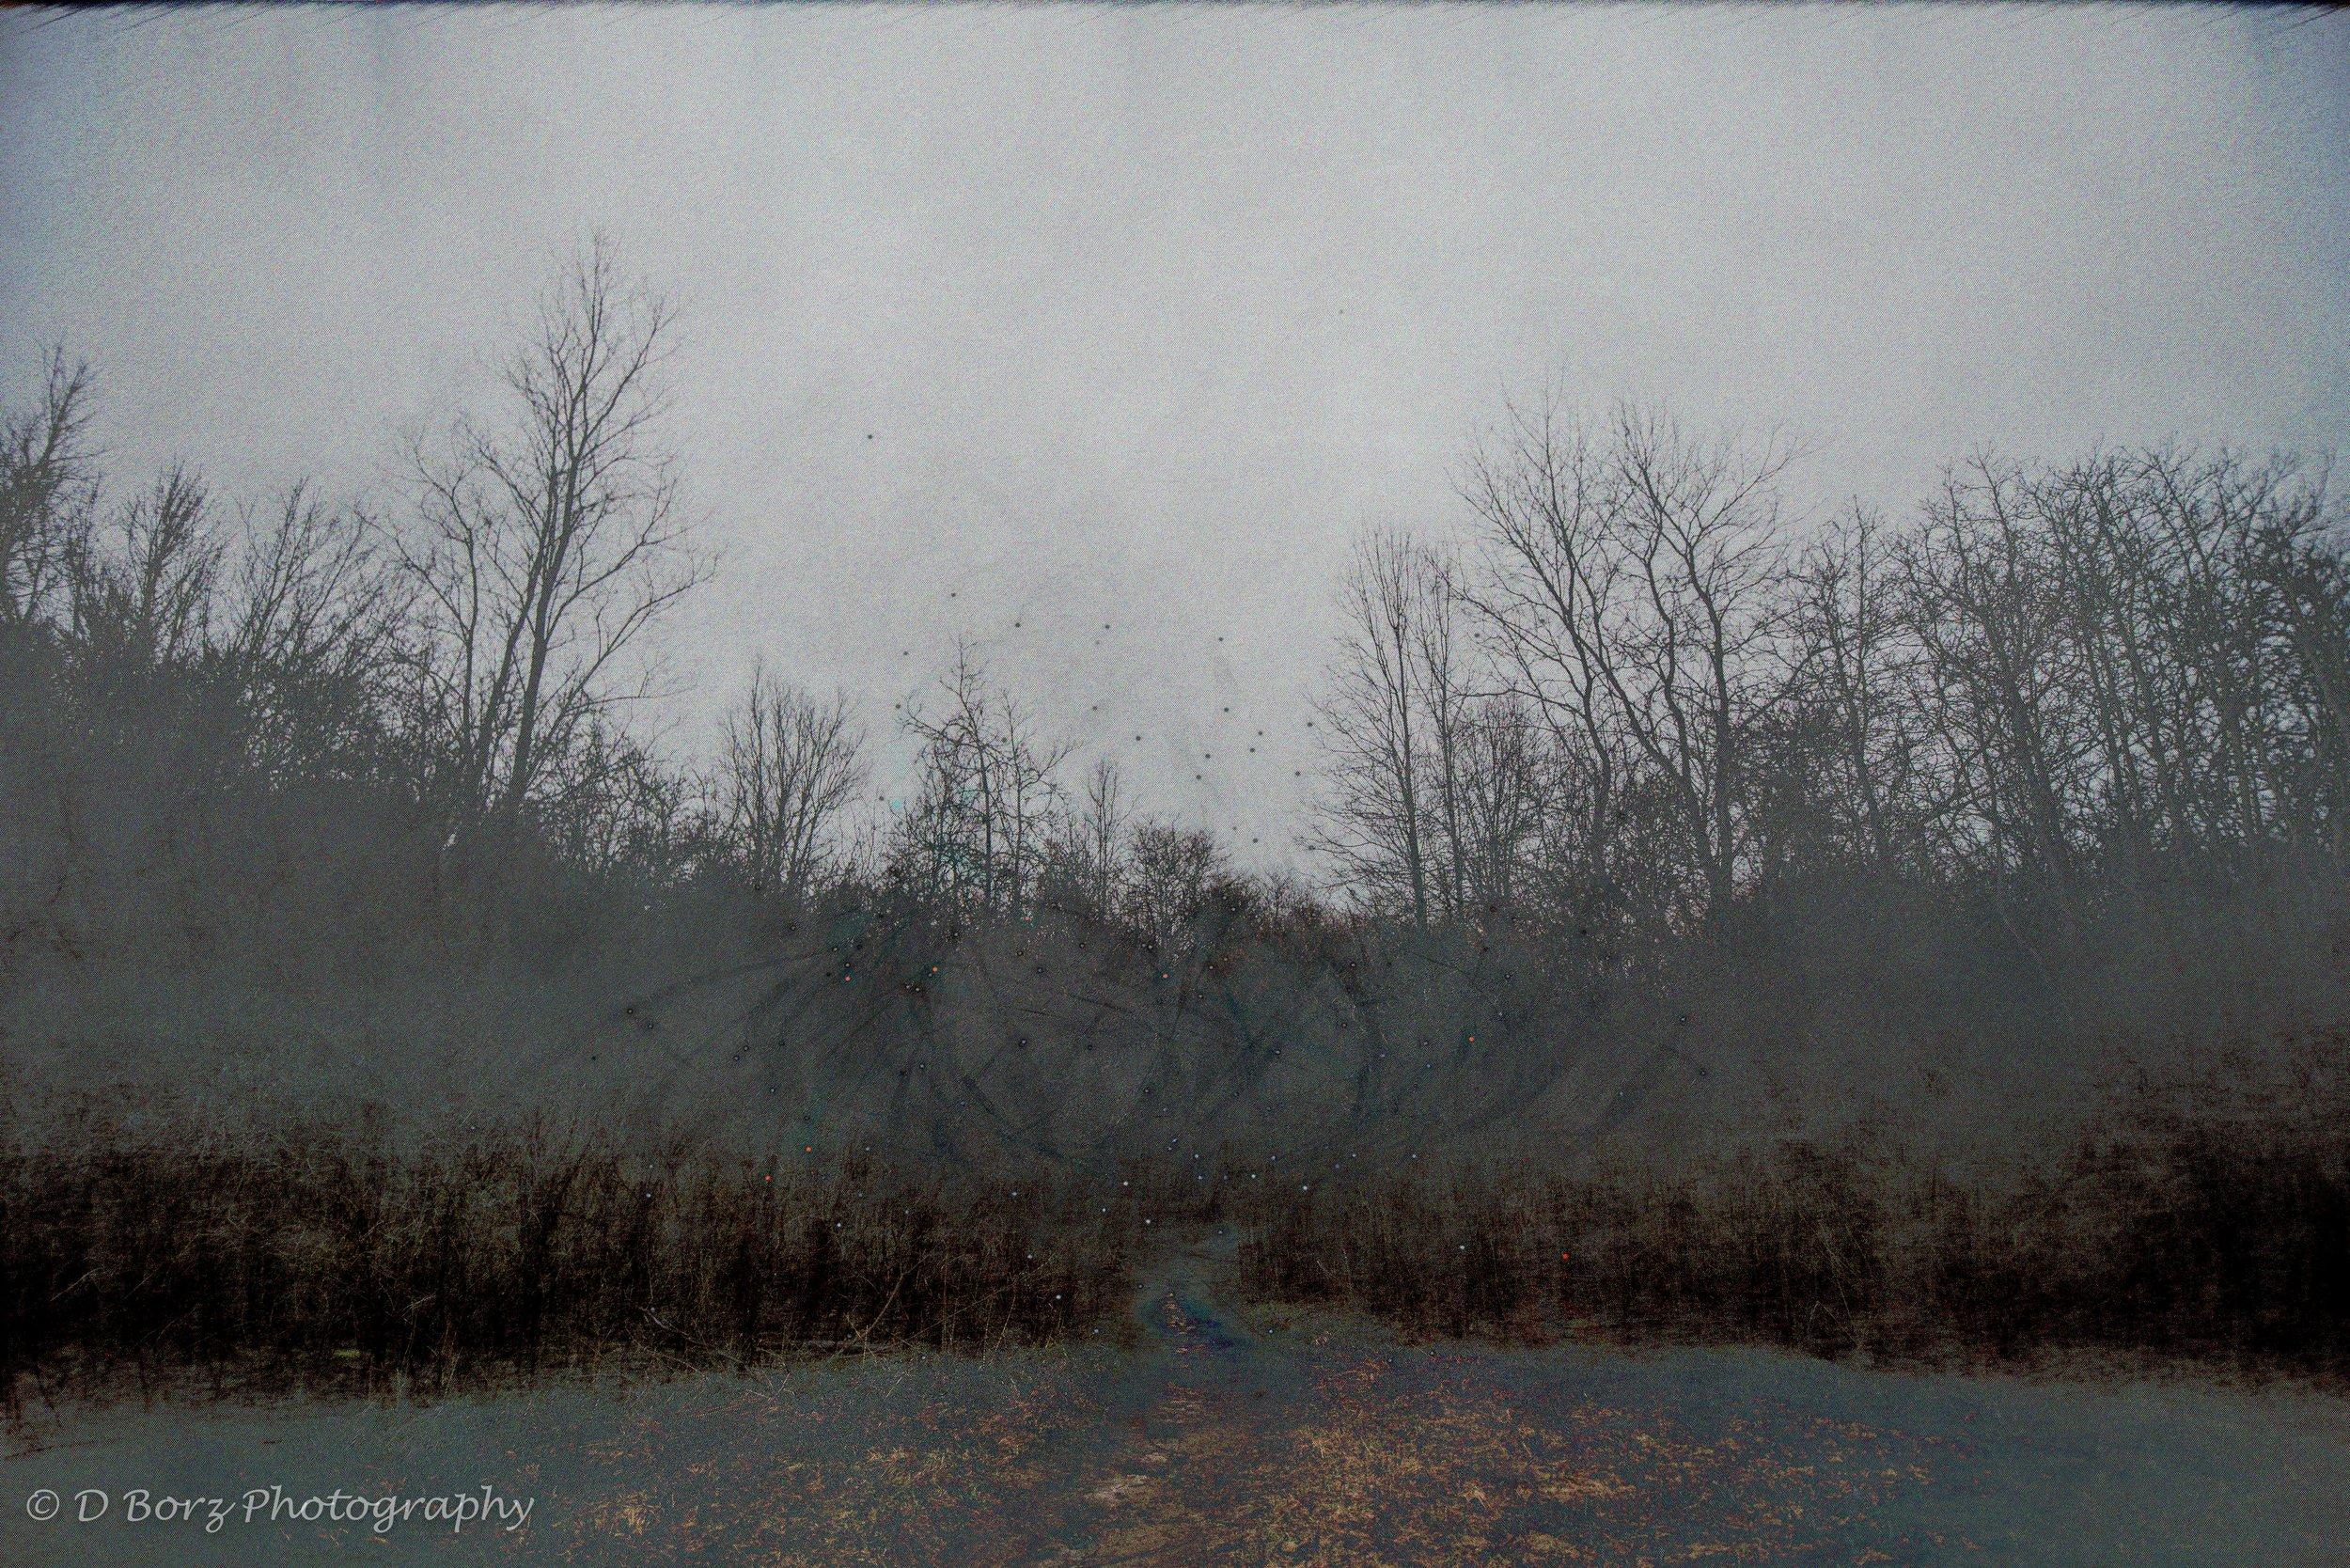 borzkowski_d_soundscape-23.jpg